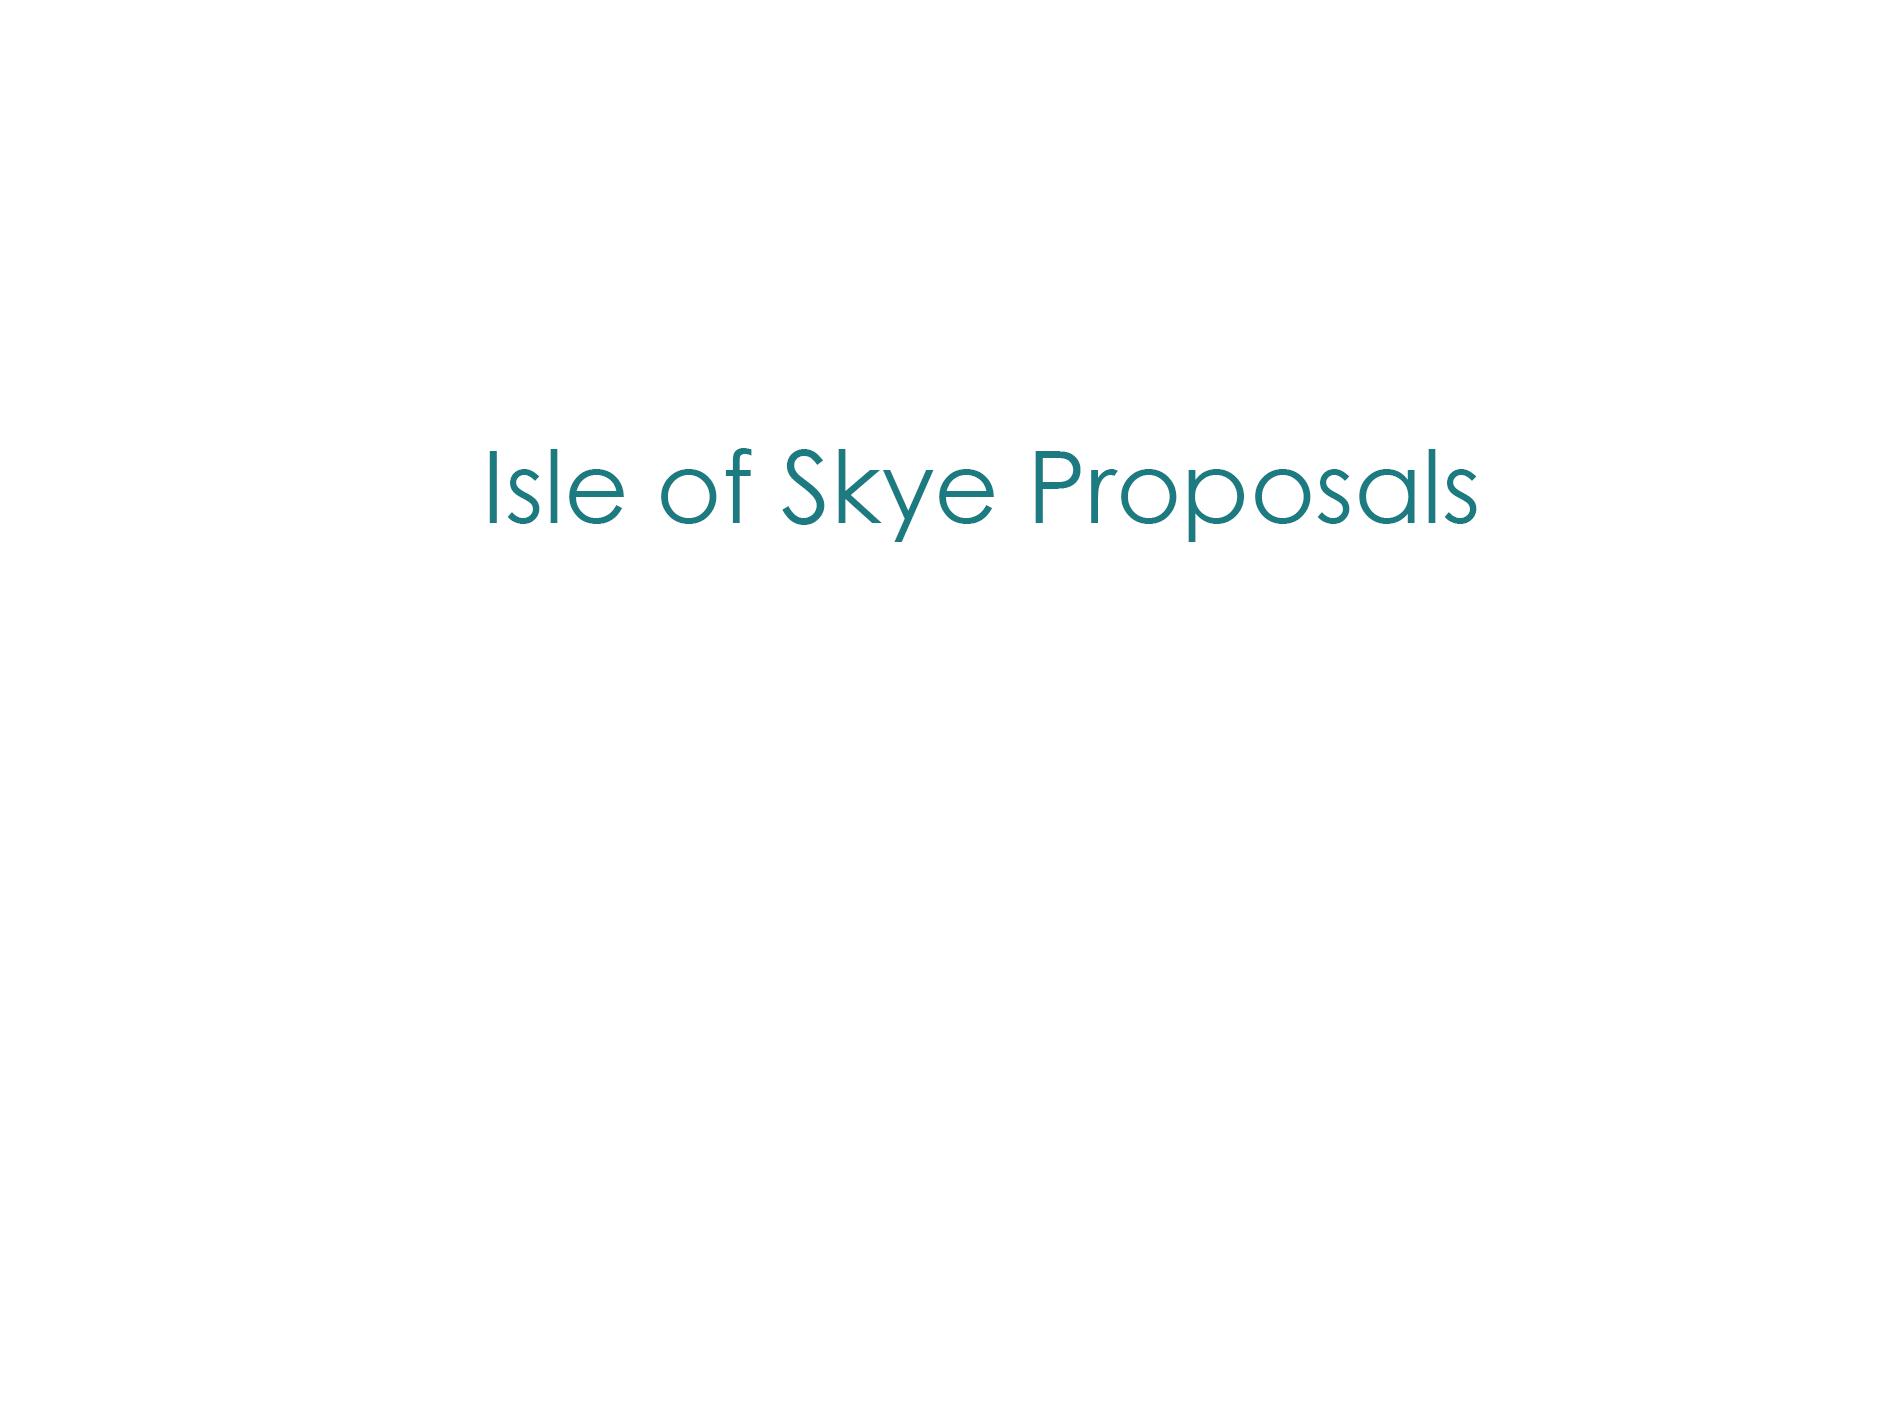 Skye Proposals